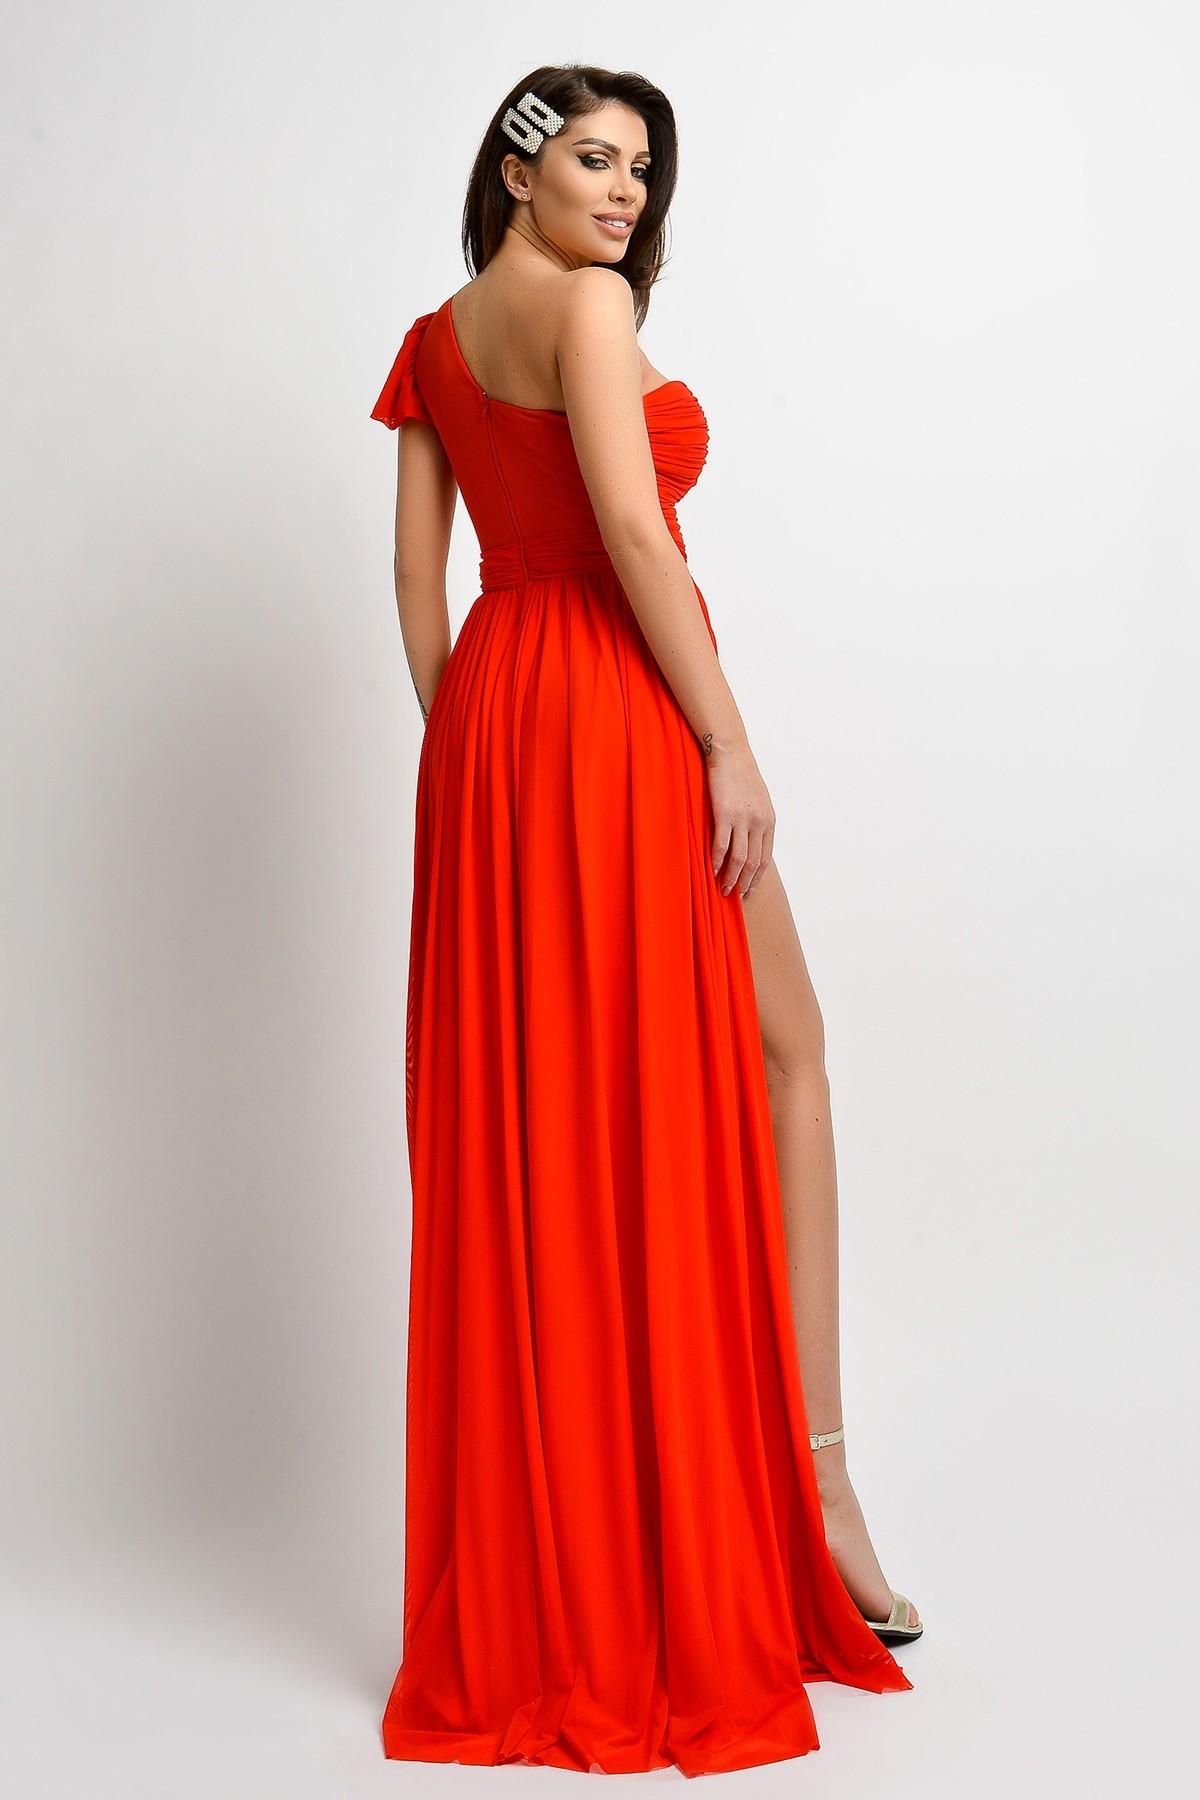 Rochie de ocazie rosie lunga din tul despicata in fata Atmosphere